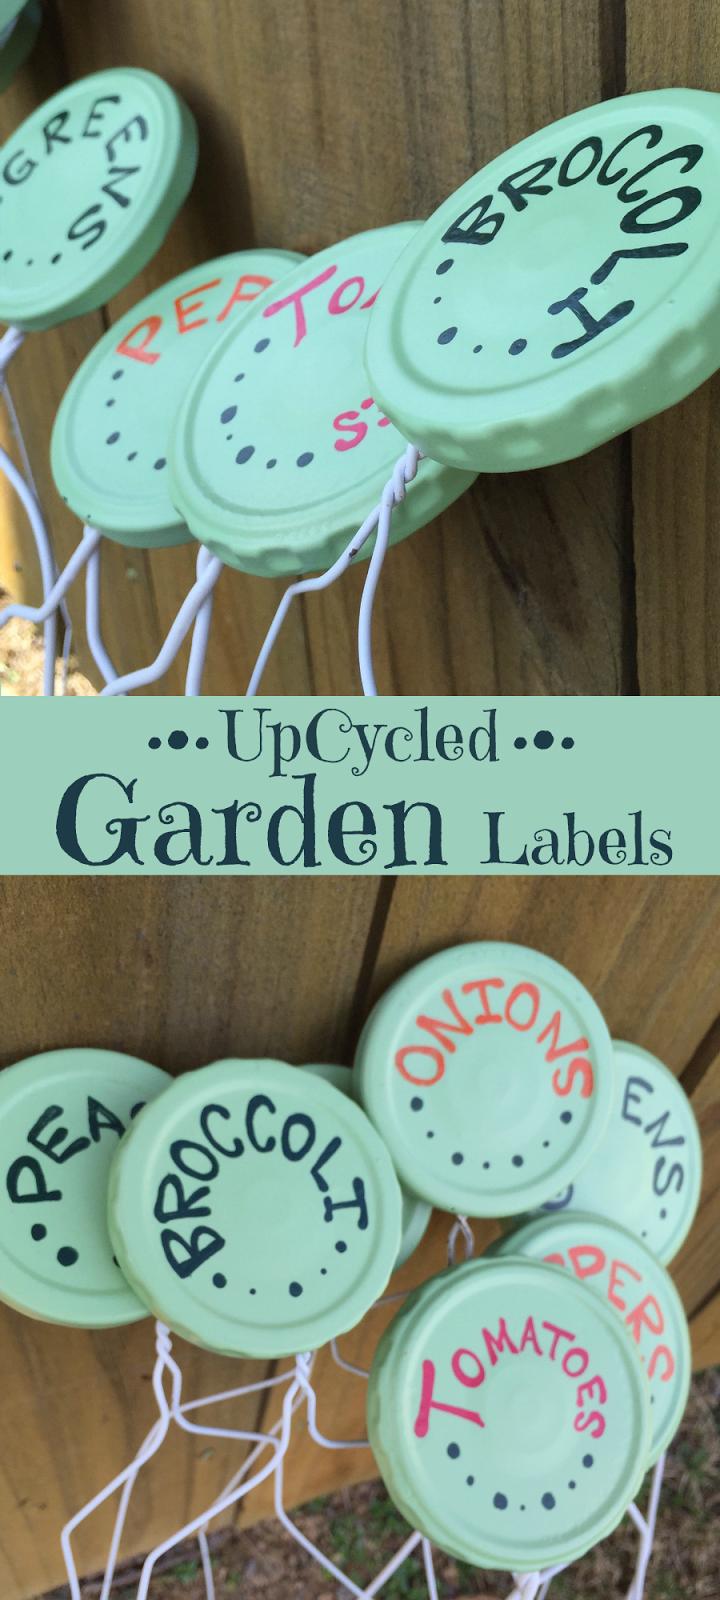 UpCycled Garden Labels | DIY Gardening | Pinterest | Garden signs ...